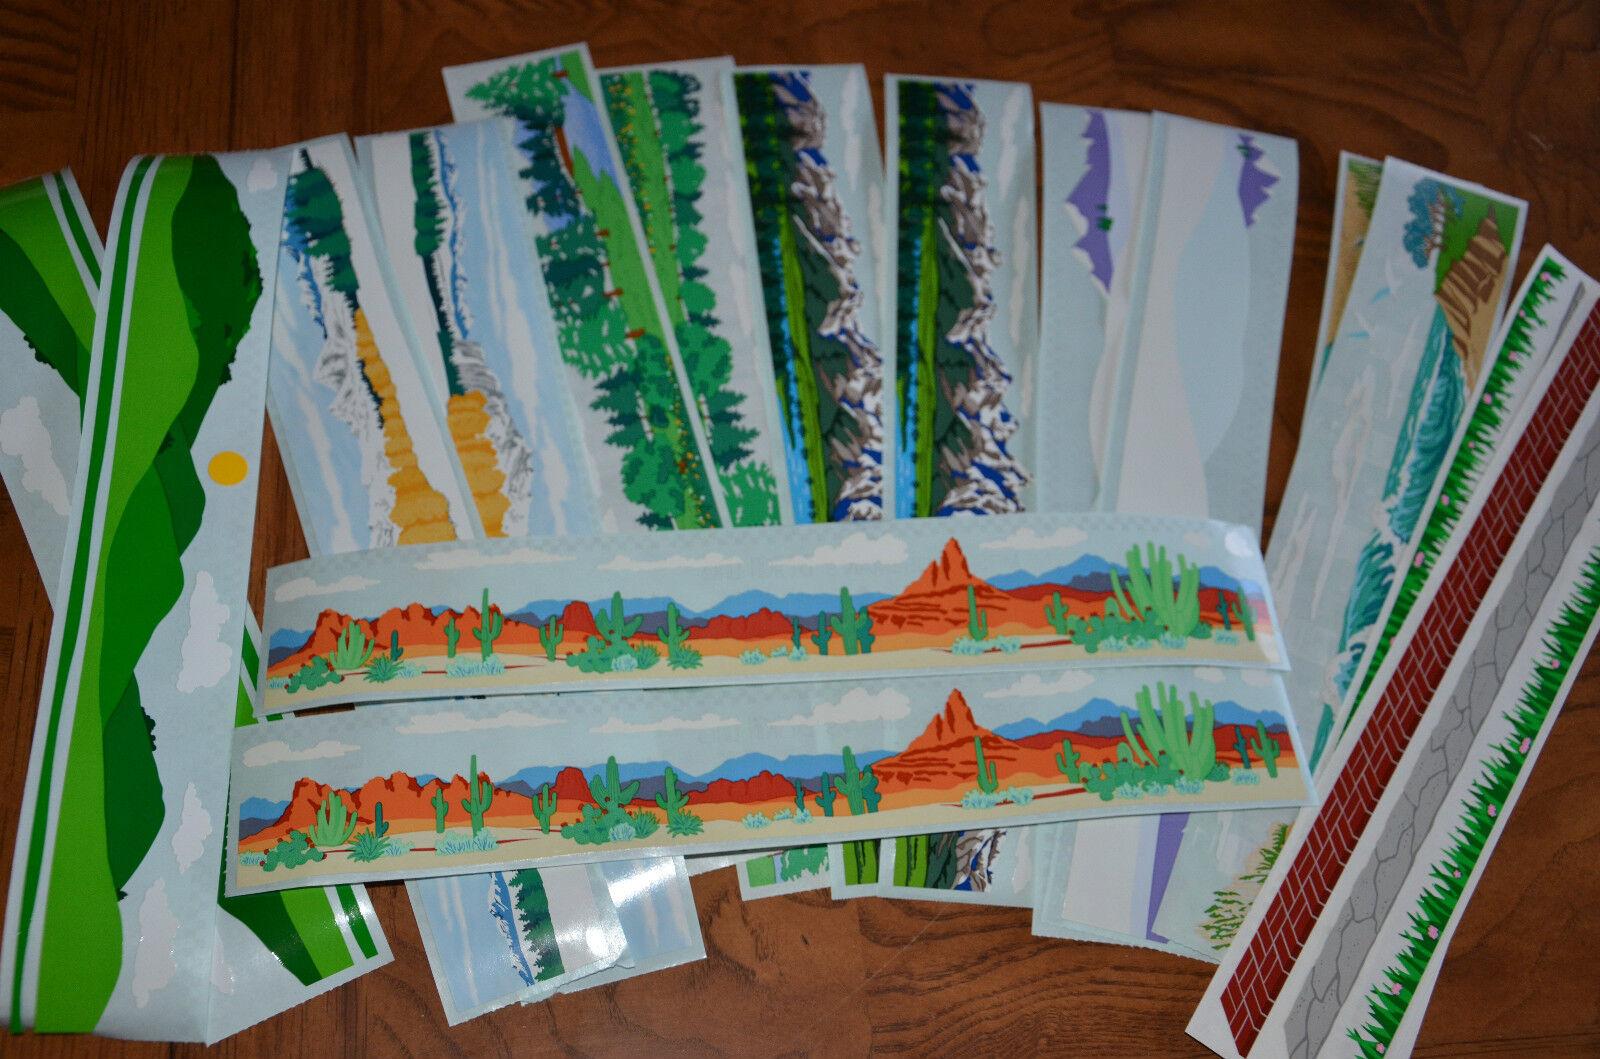 Mrs. Grossman Landscape Design Lines You Choose Ocean, Desert 2